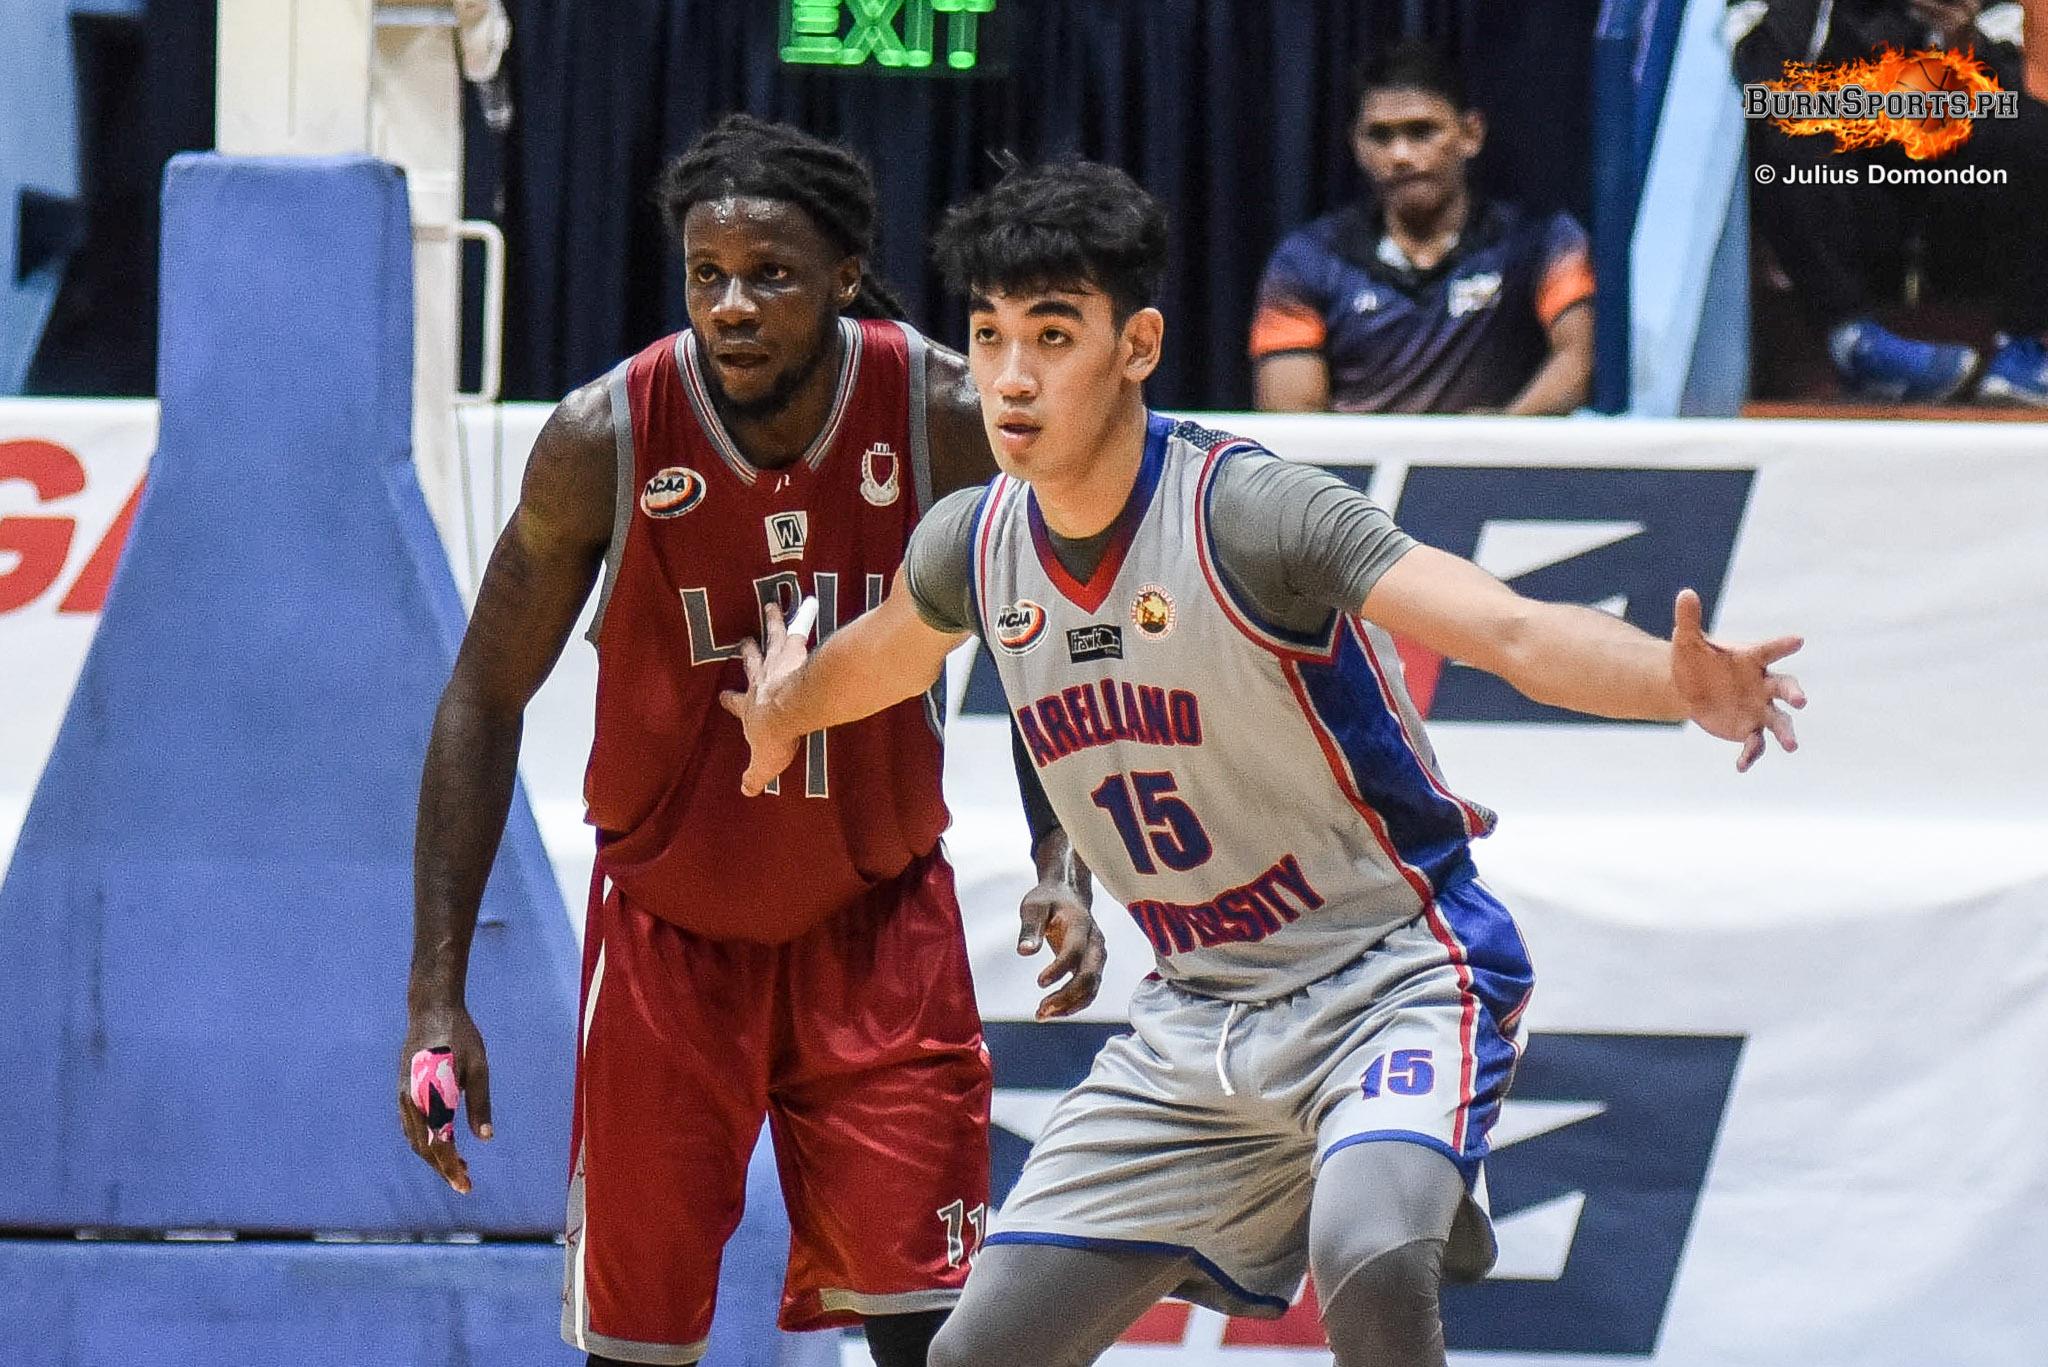 Justin Arana scores 24 to boost Arellano past Lyceum